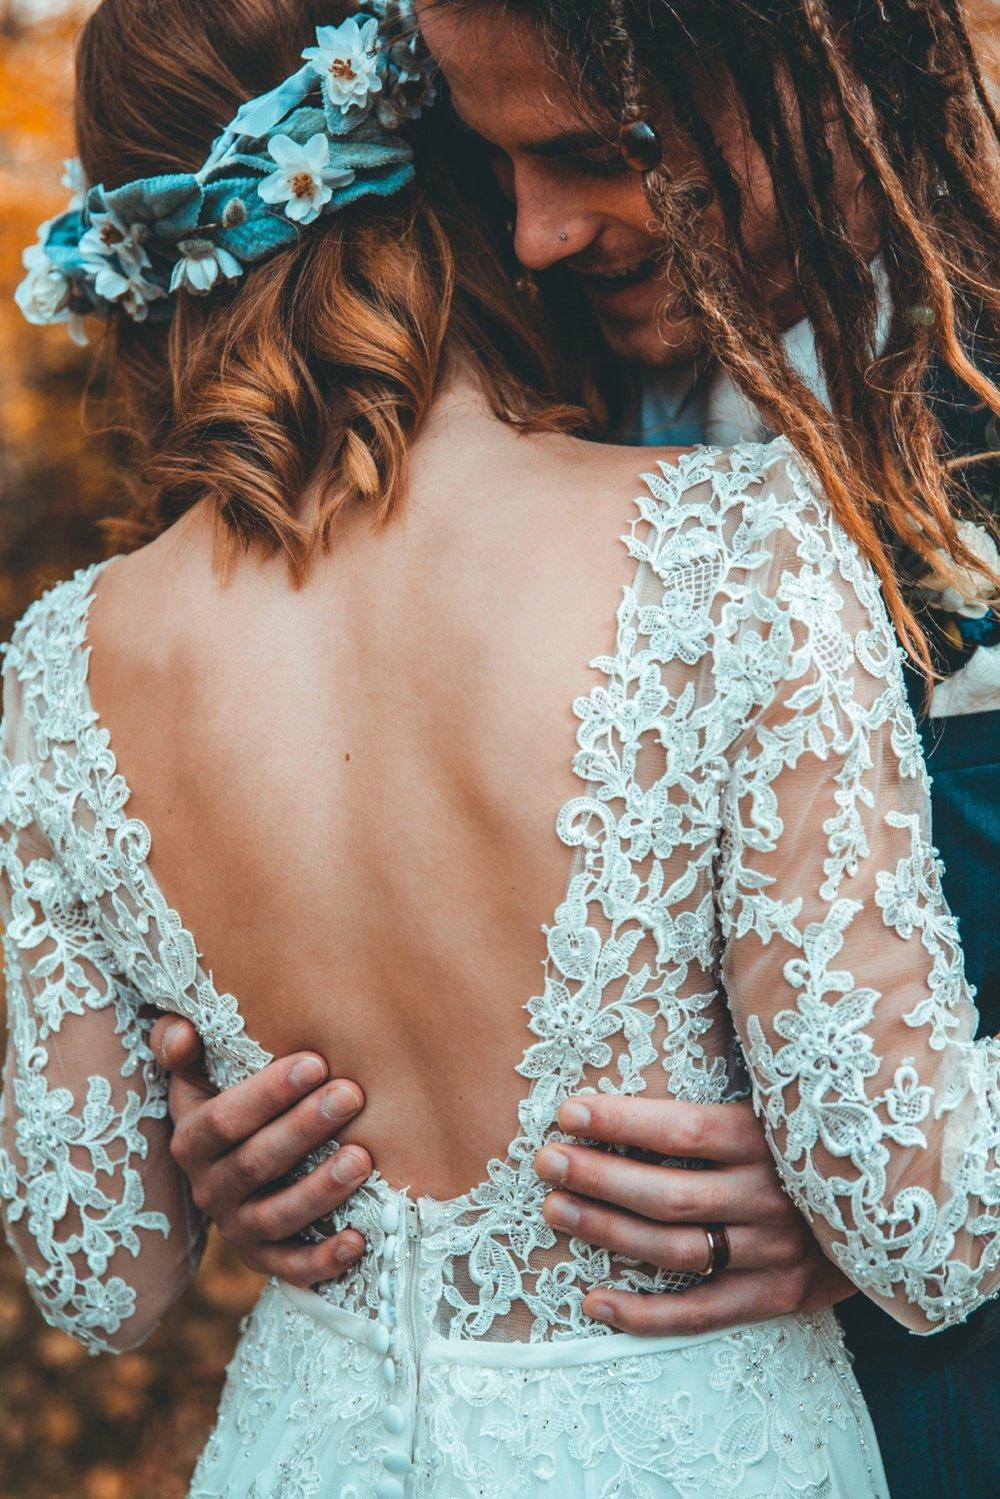 pantone studio wedding theme inspiration